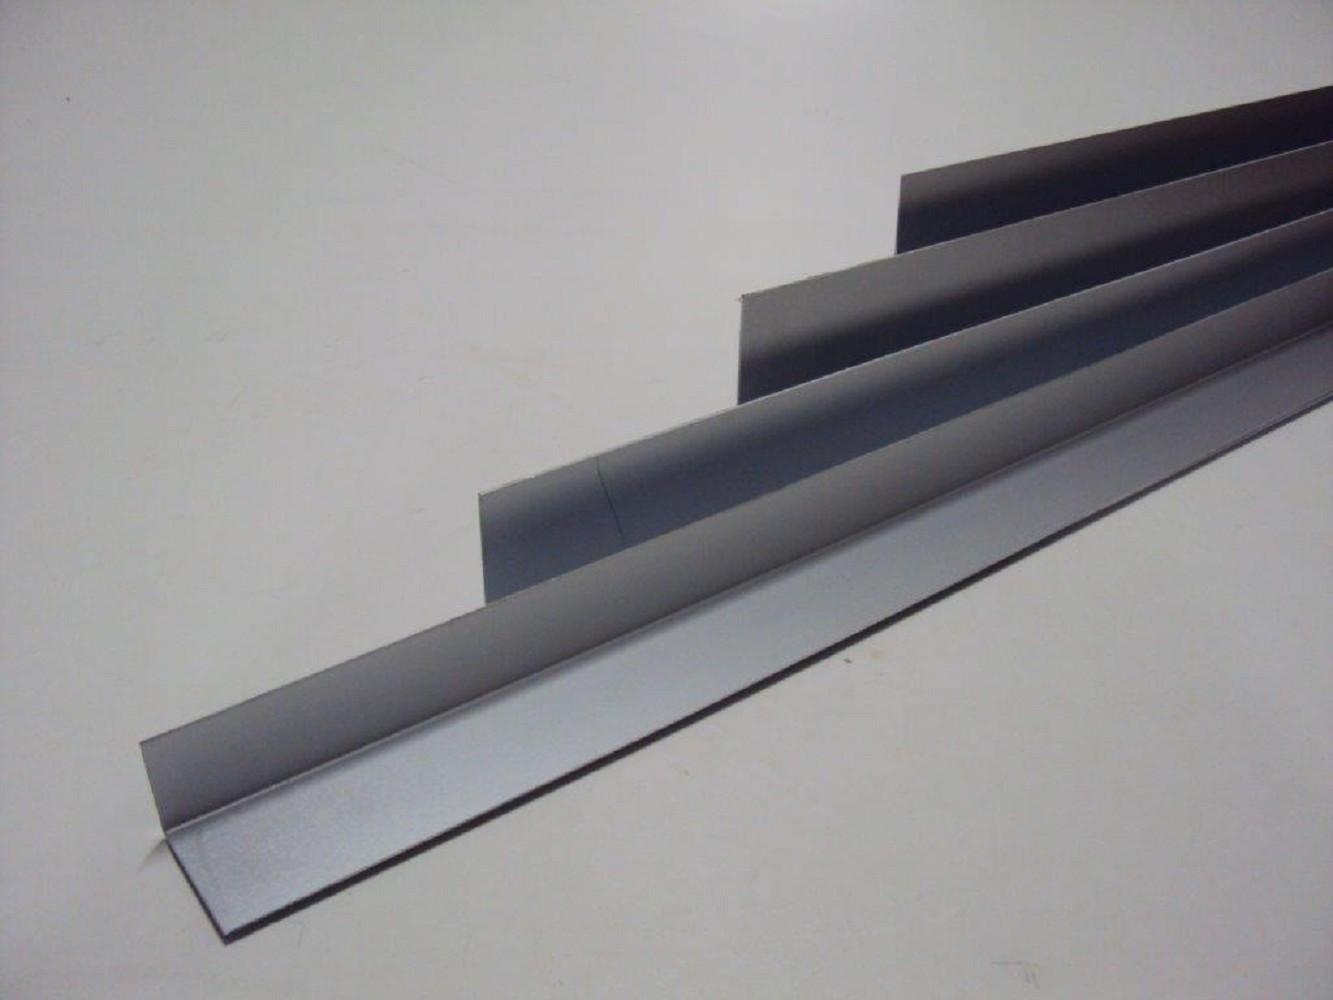 aluminiumblech winkel f r balkone winkelblech f r balkon. Black Bedroom Furniture Sets. Home Design Ideas